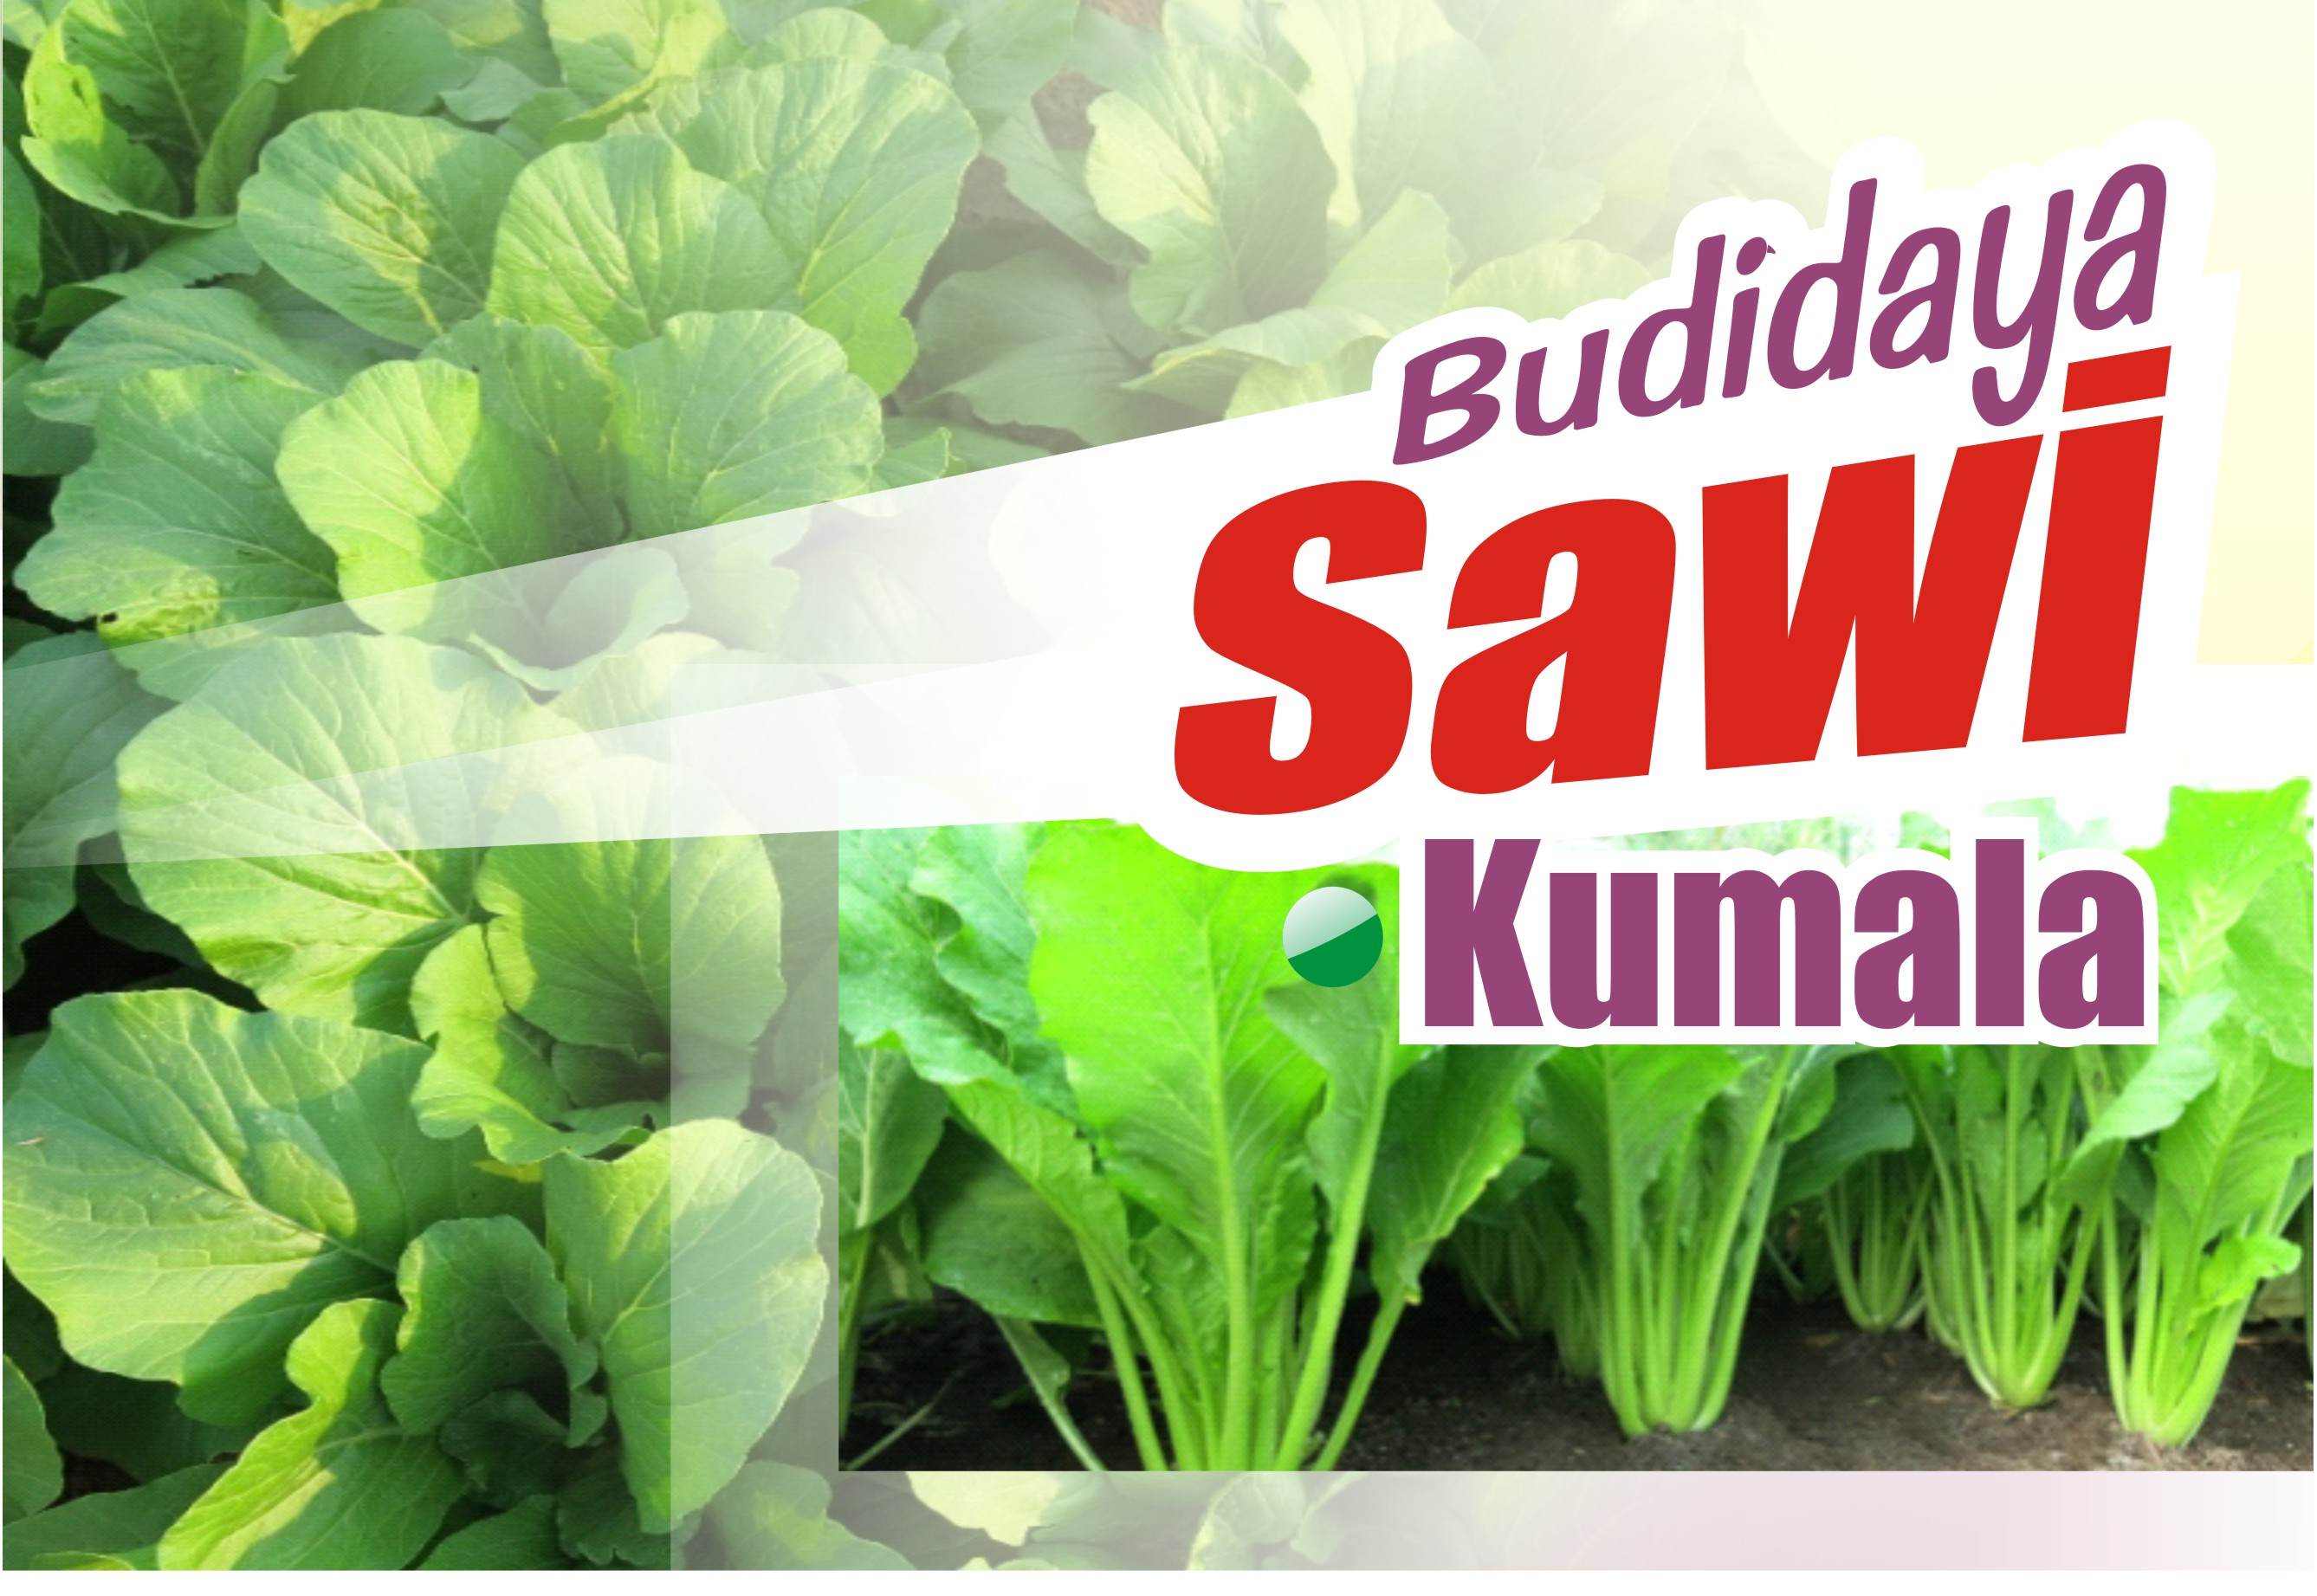 Budidaya Sawi Kumala